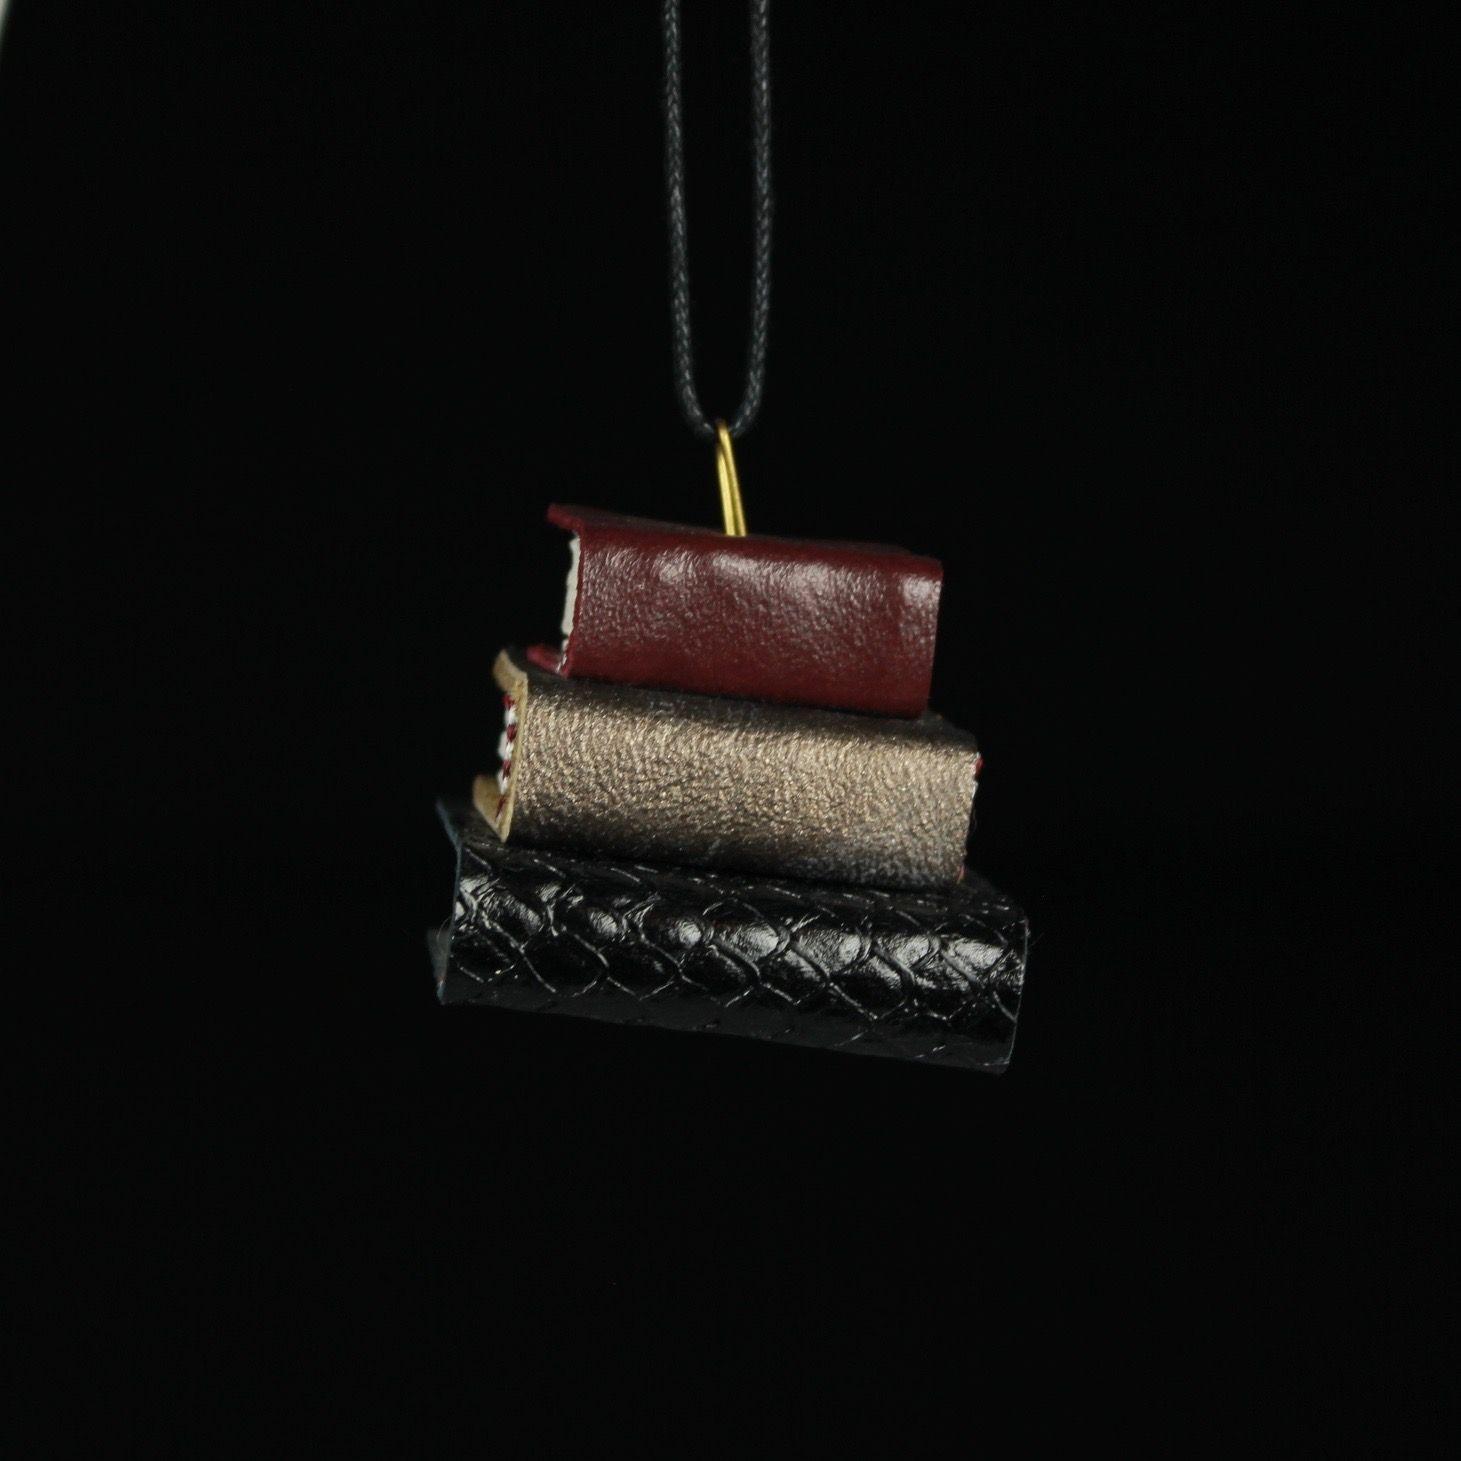 Burgandy, Gold, & Black Book Ornament